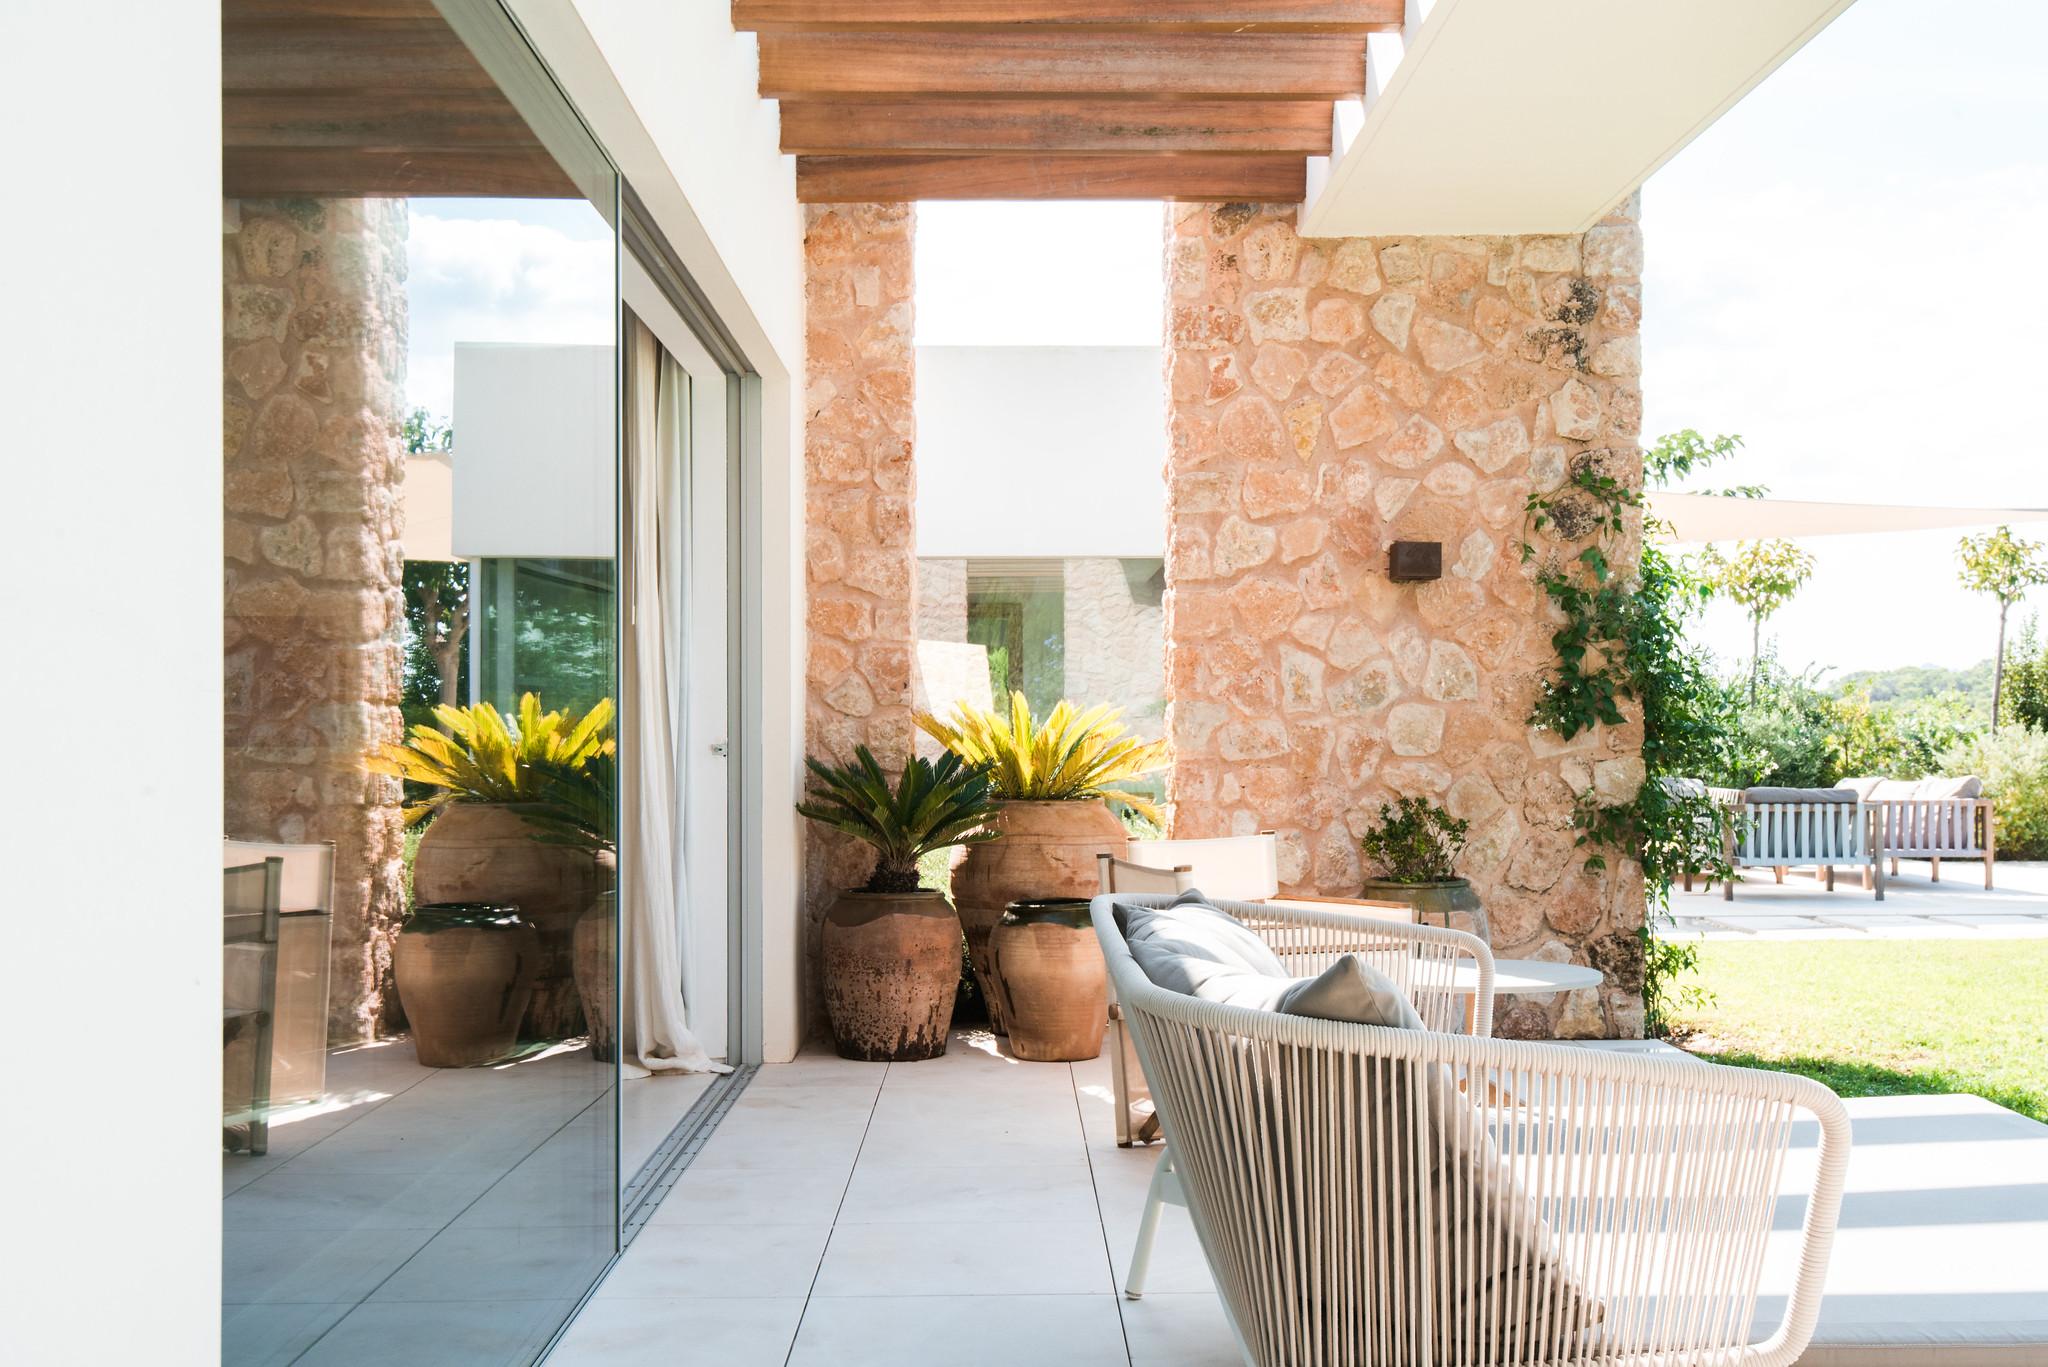 https://www.white-ibiza.com/wp-content/uploads/2020/06/white-ibiza-villas-villa-amber-exterior-detail.jpg